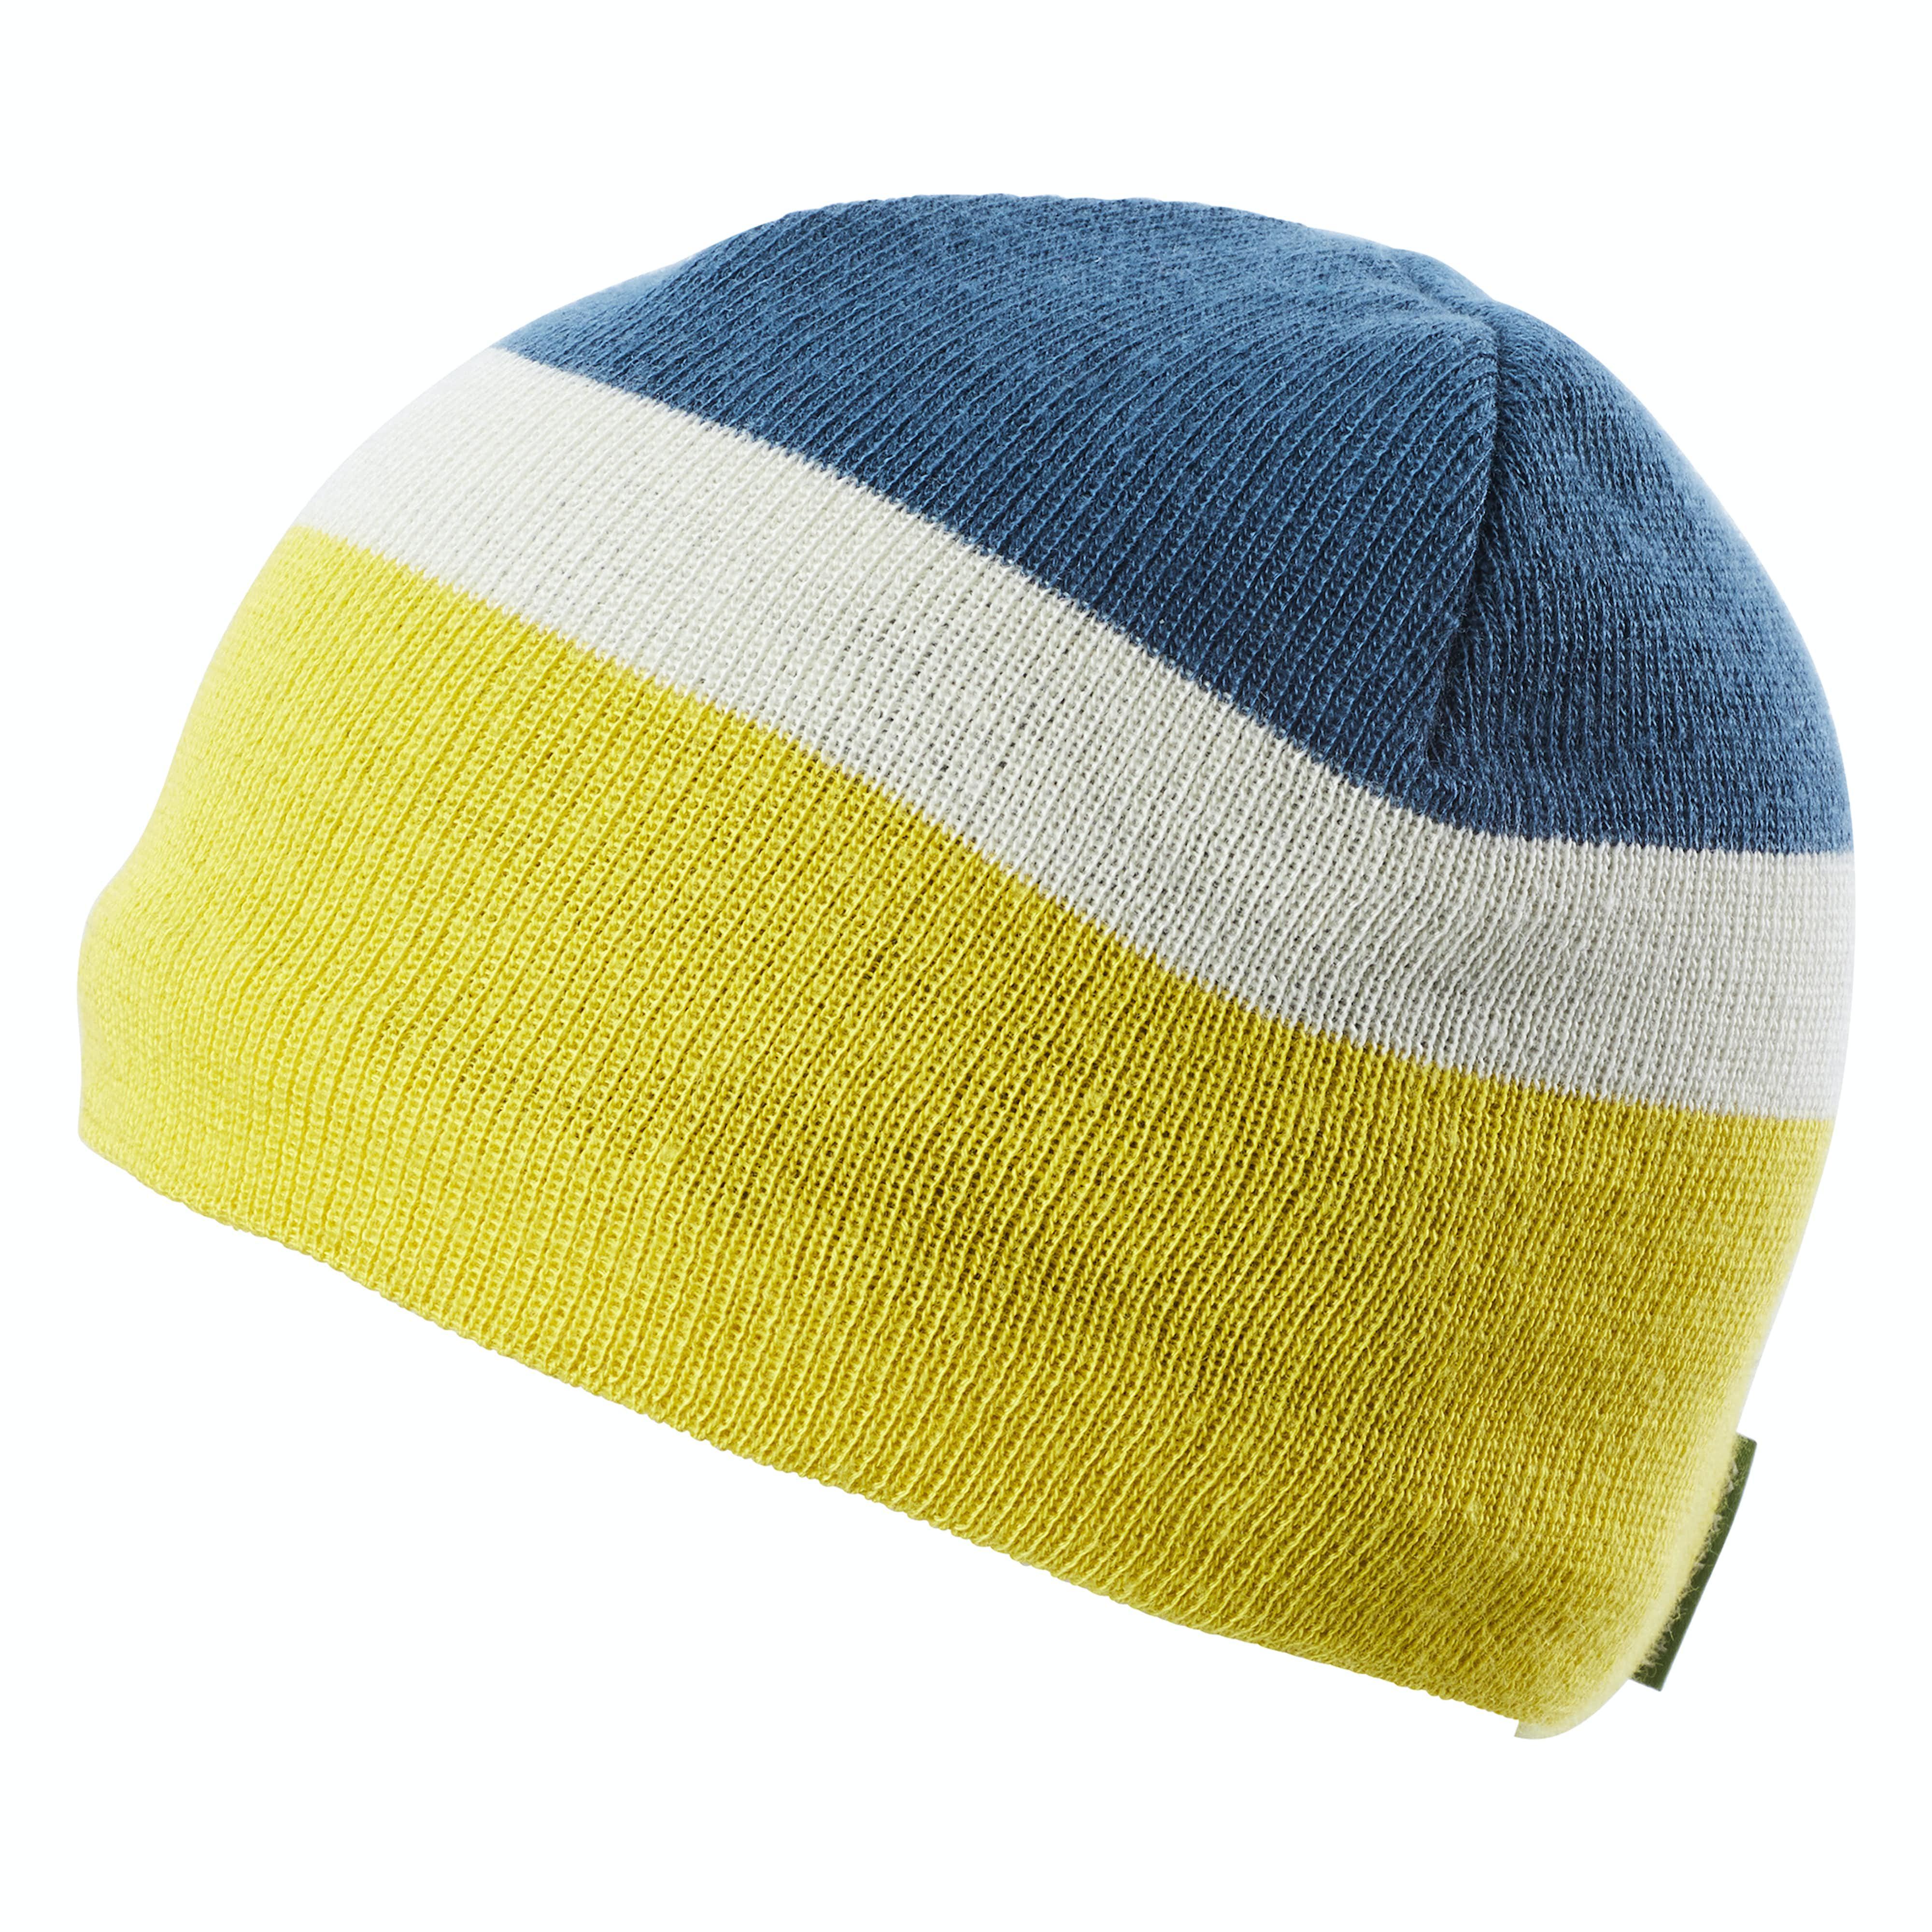 b4f11ccc4ec5fc Kids Hats: Beanie, Cap, Scarf for Boys & Girls | Kathmandu NZ